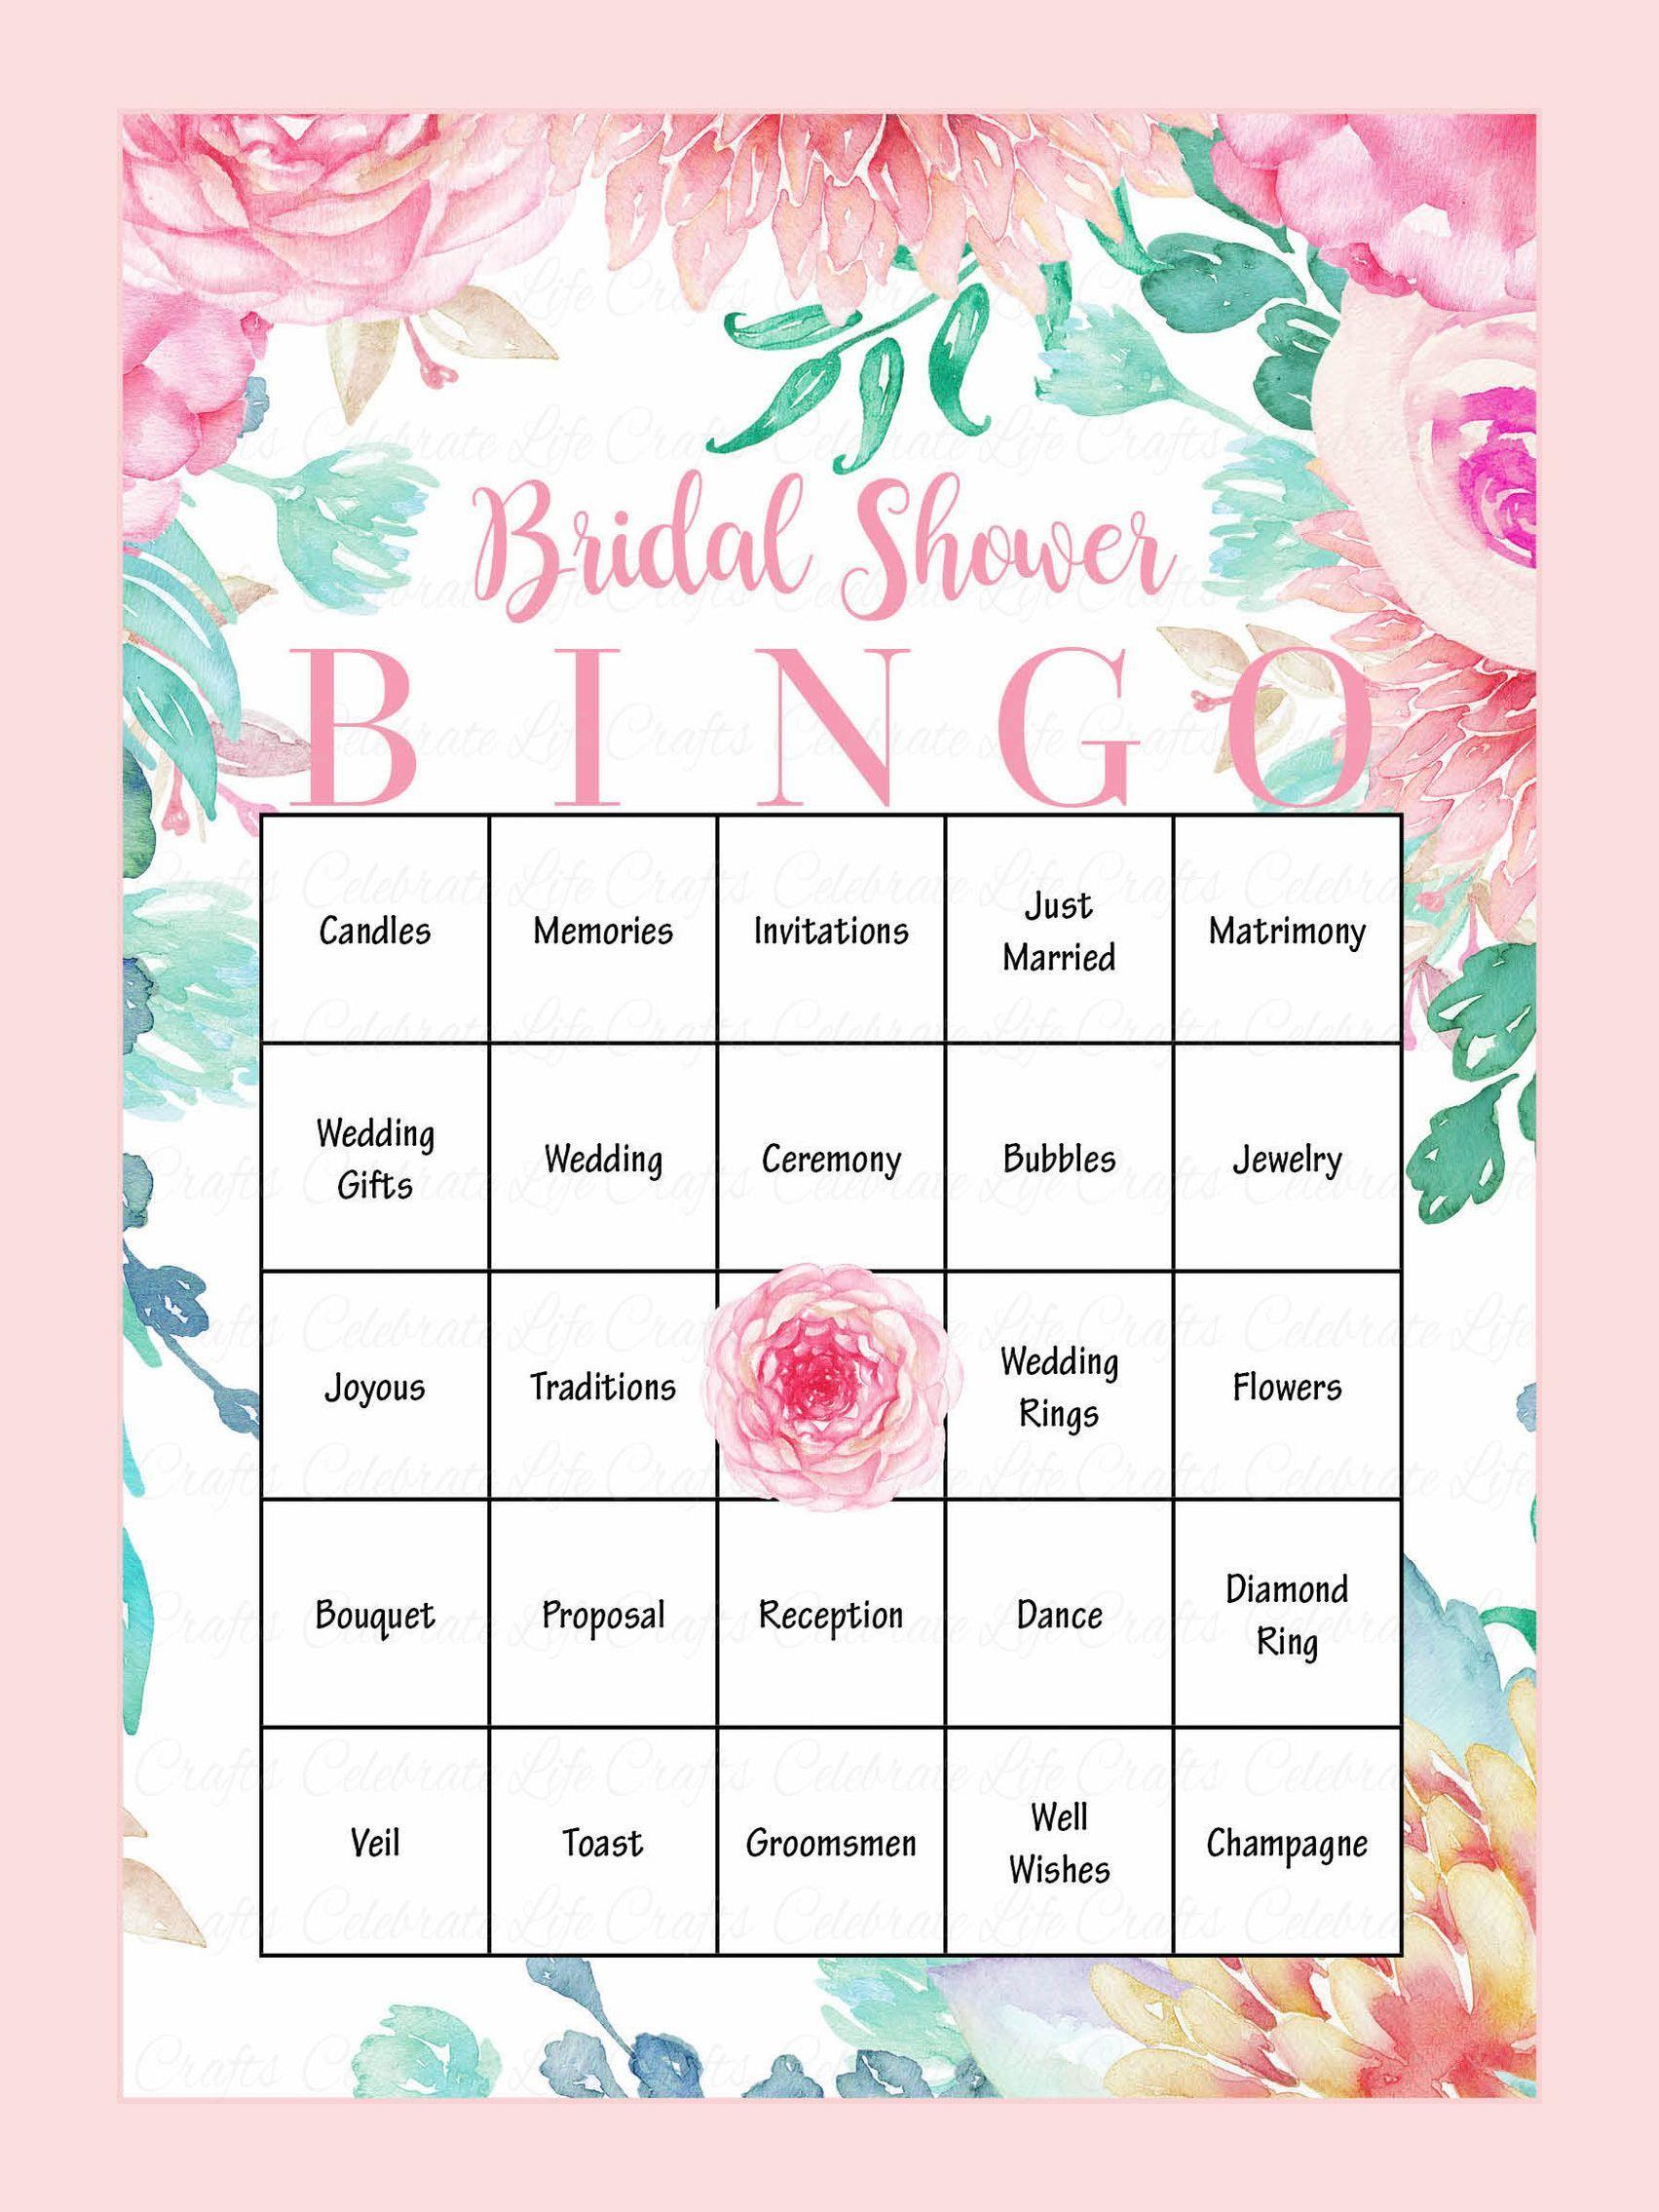 10 Printable Bridal Shower Games You Can Diy   Bridal Shower